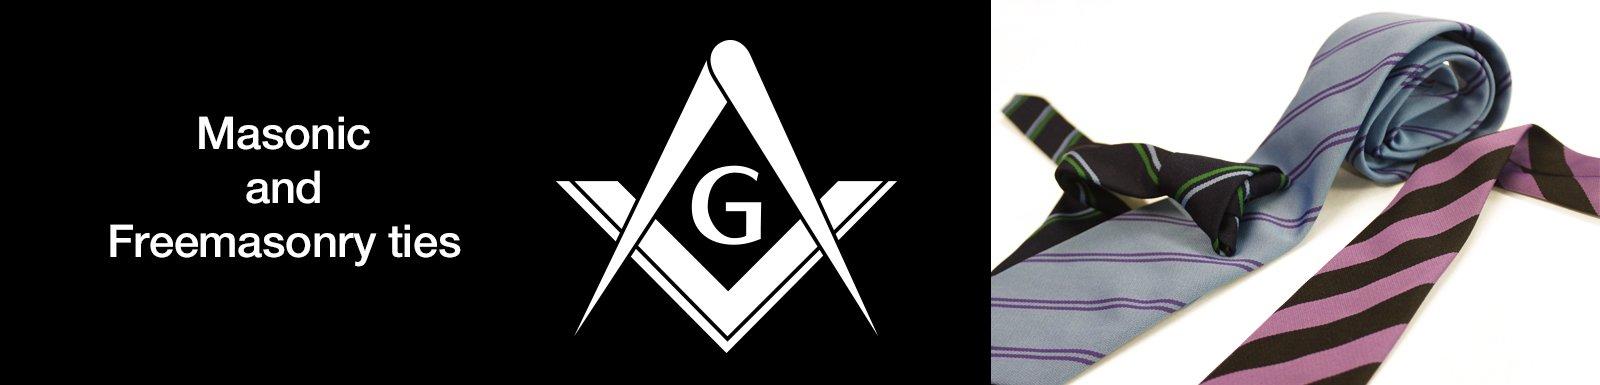 Masonic Ties - Custom Freemason Ties - Designed & Made in England